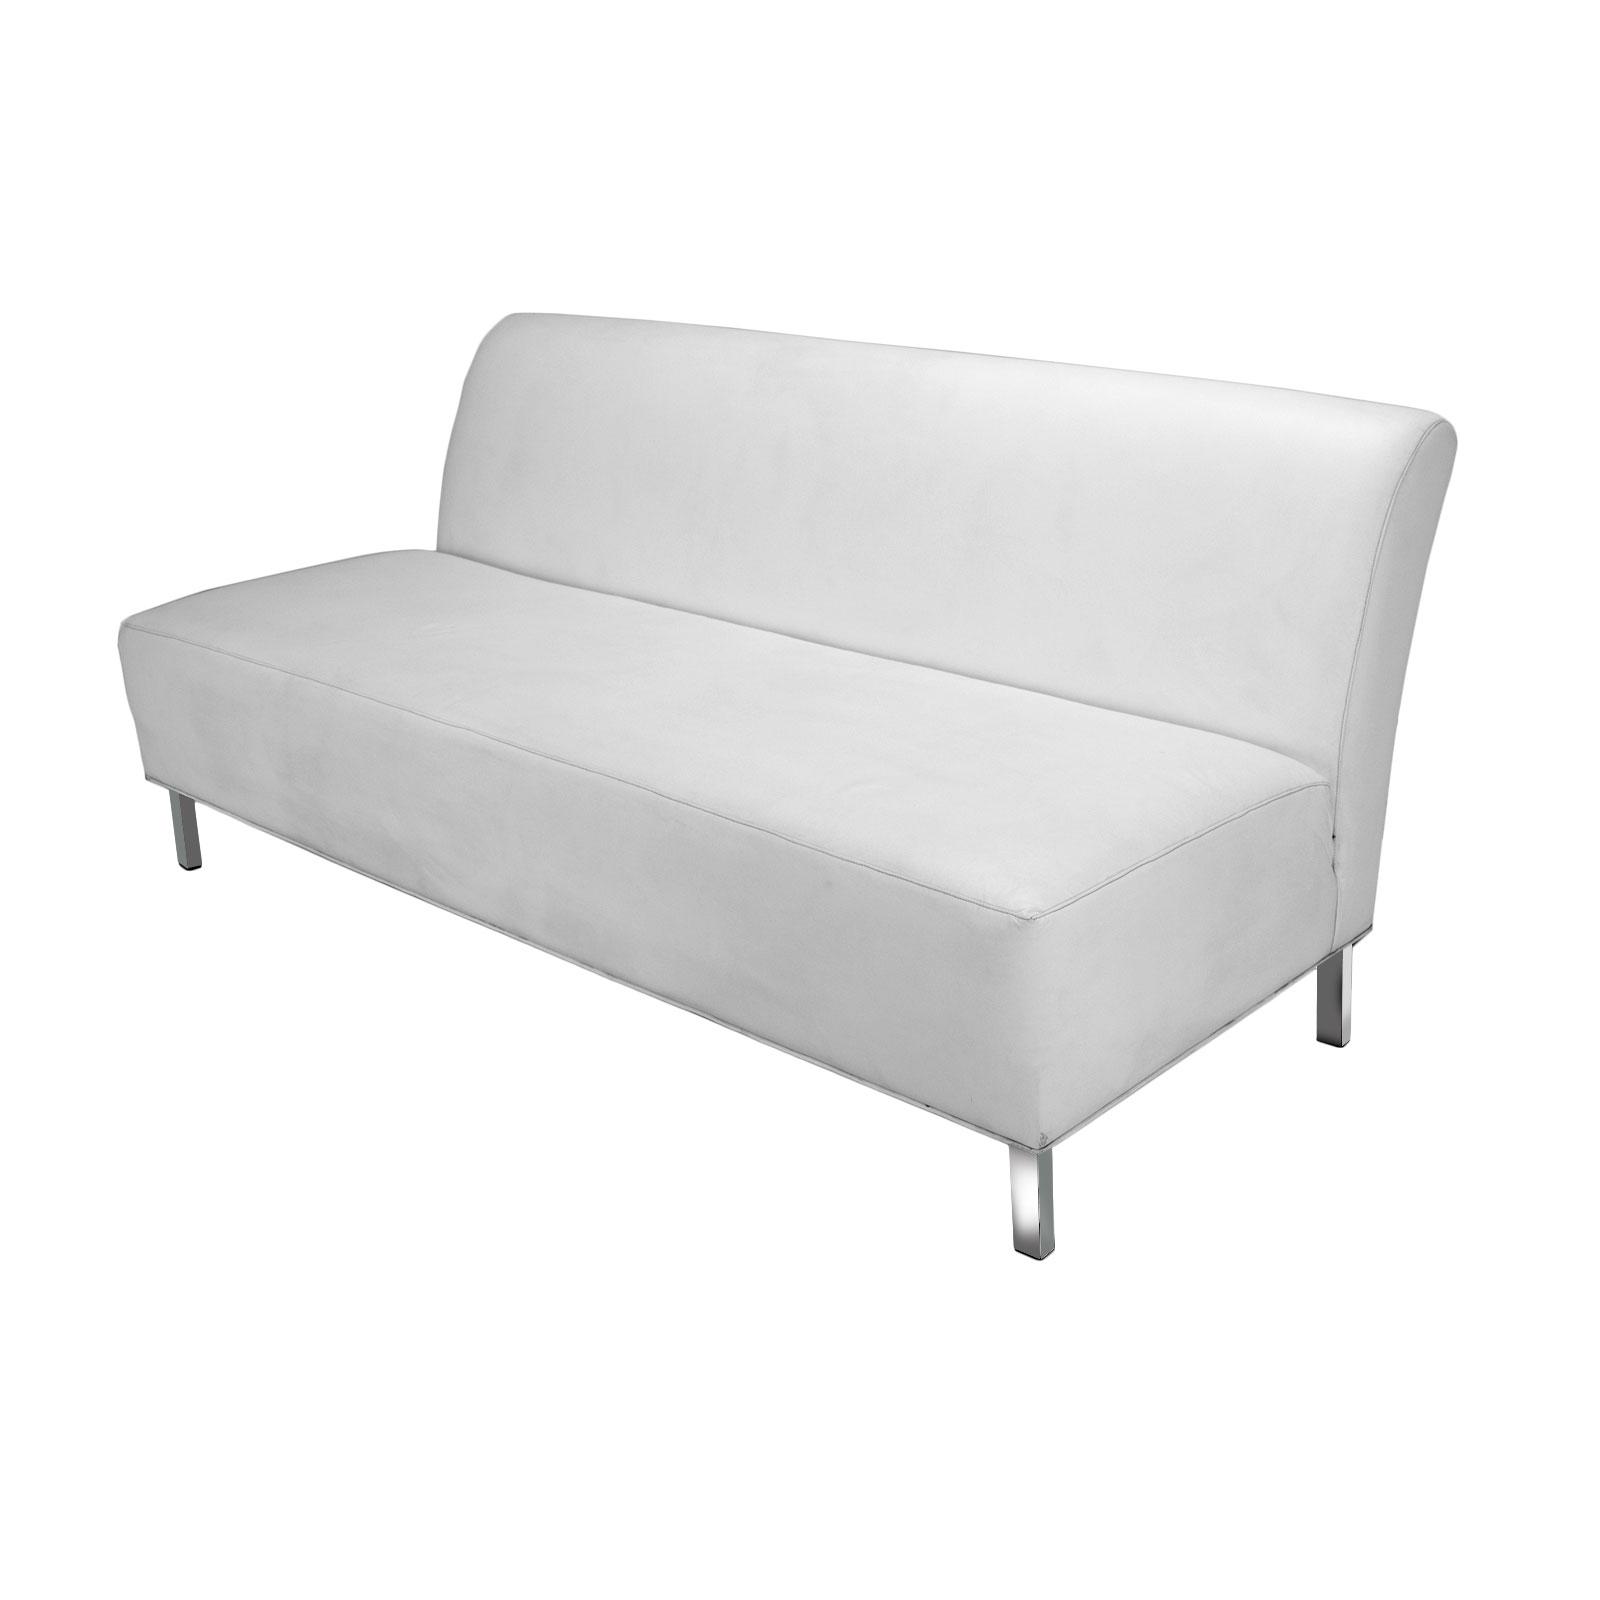 rental sofa rose gold sofas uk modular rentals event furniture